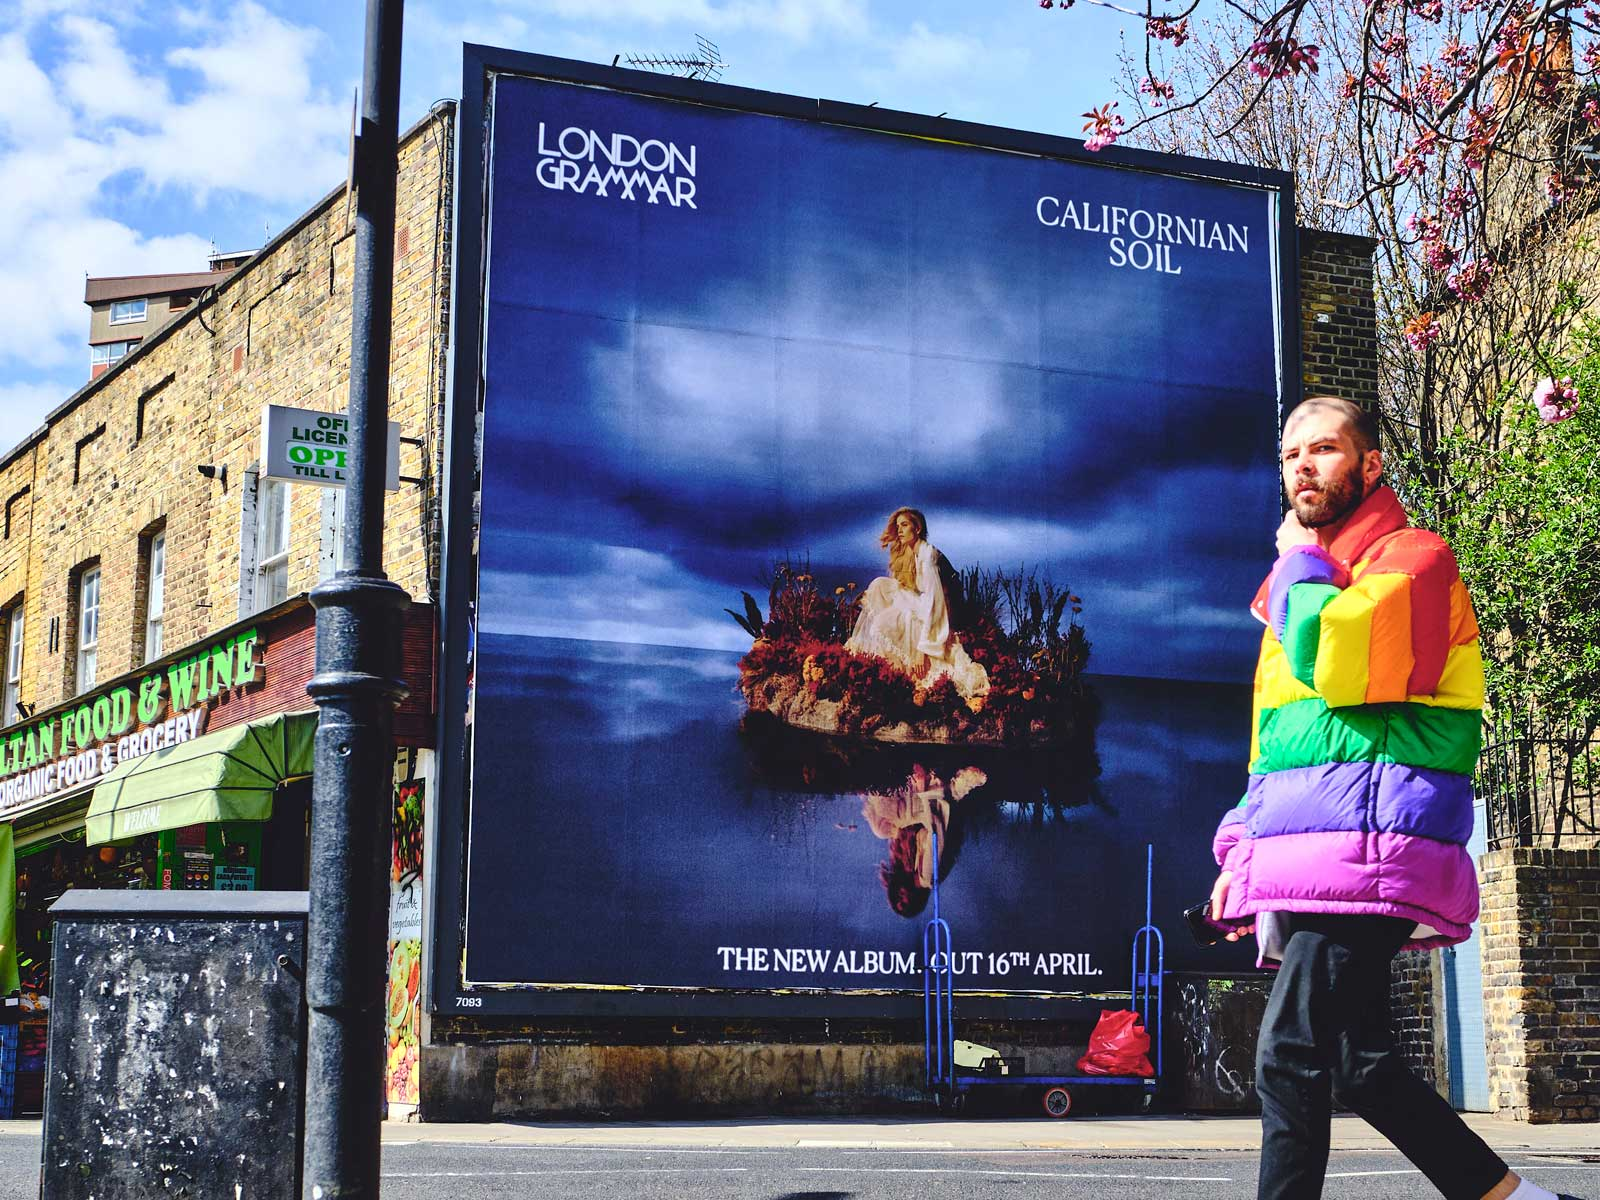 London Grammar: Californian Soil - Street posters - DIABOLICAL